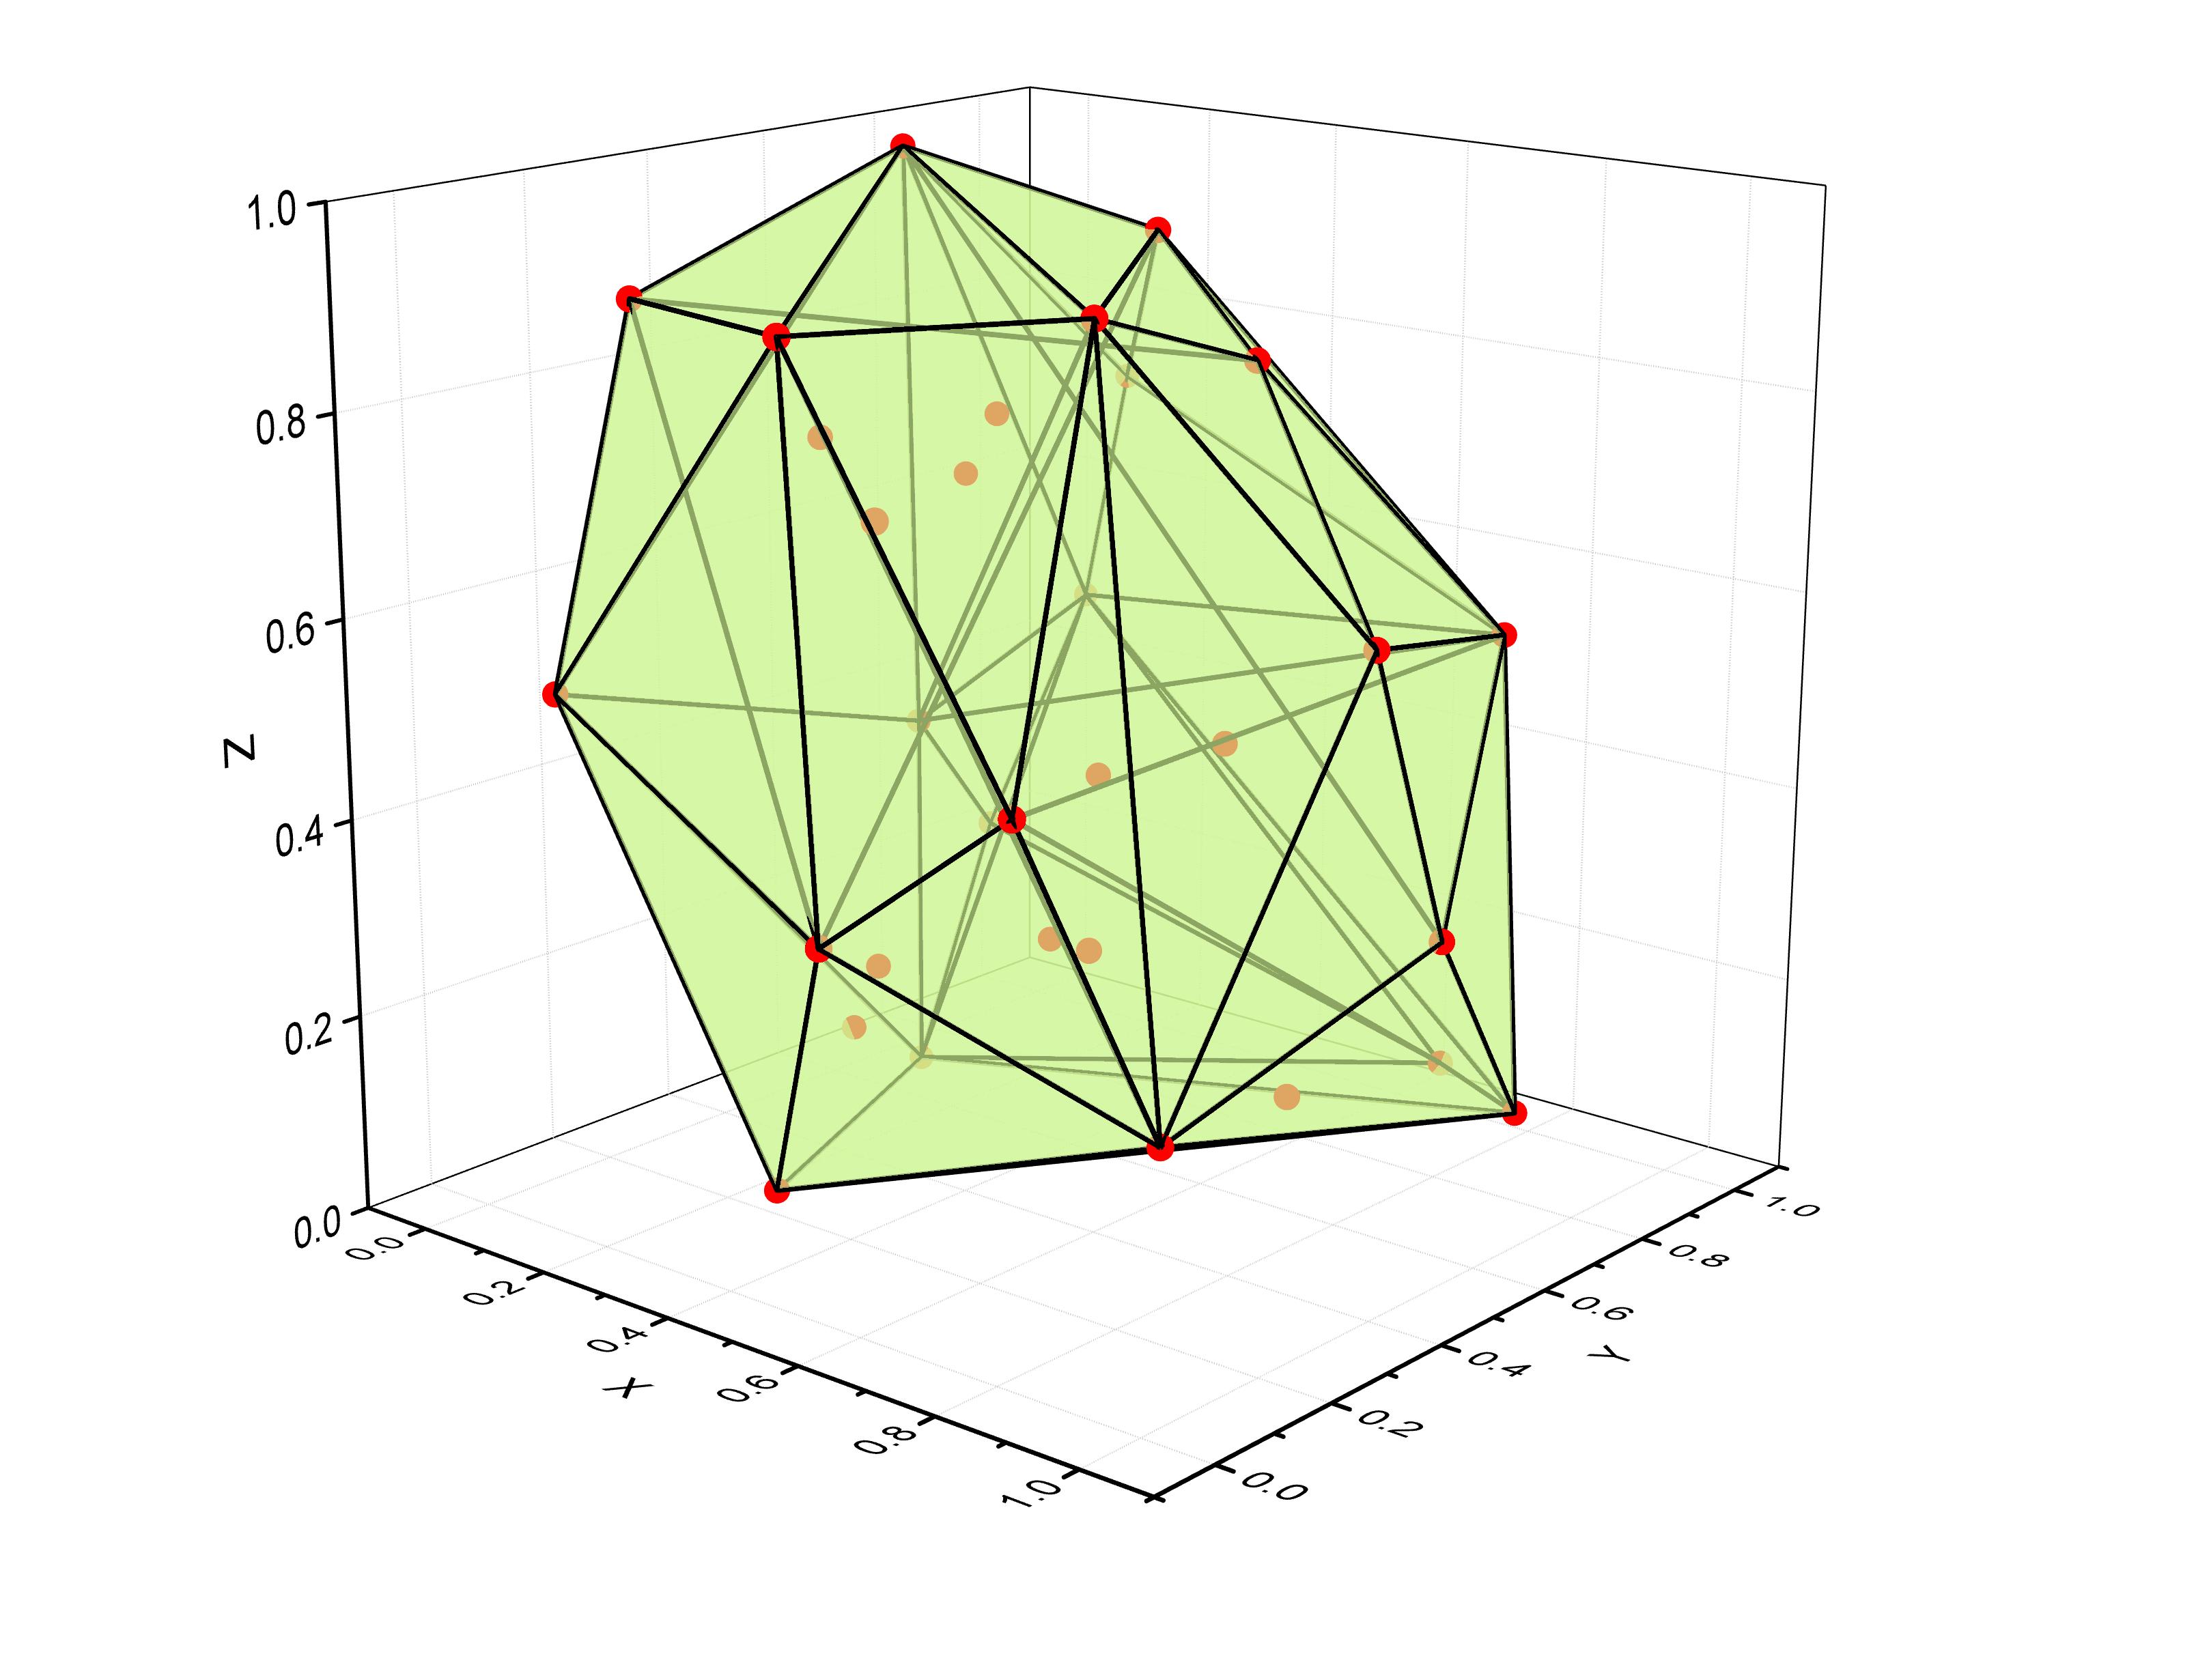 Program custom graphing and analysis routines in Origin